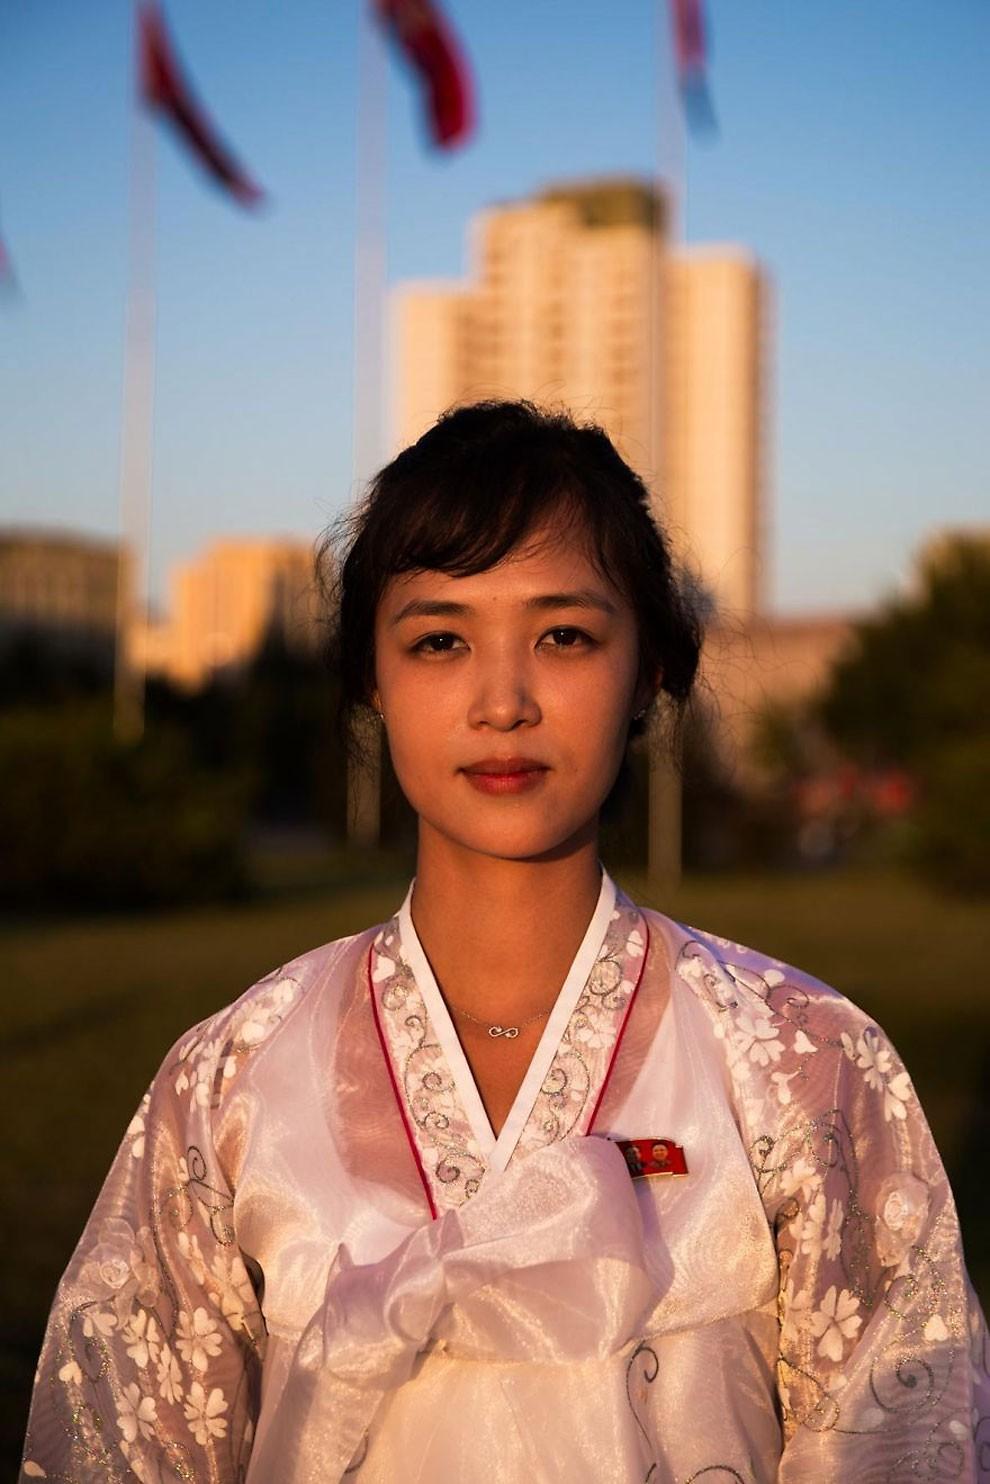 foto-donne-corea-atlas-of-beauty-mihaela-noroc-04